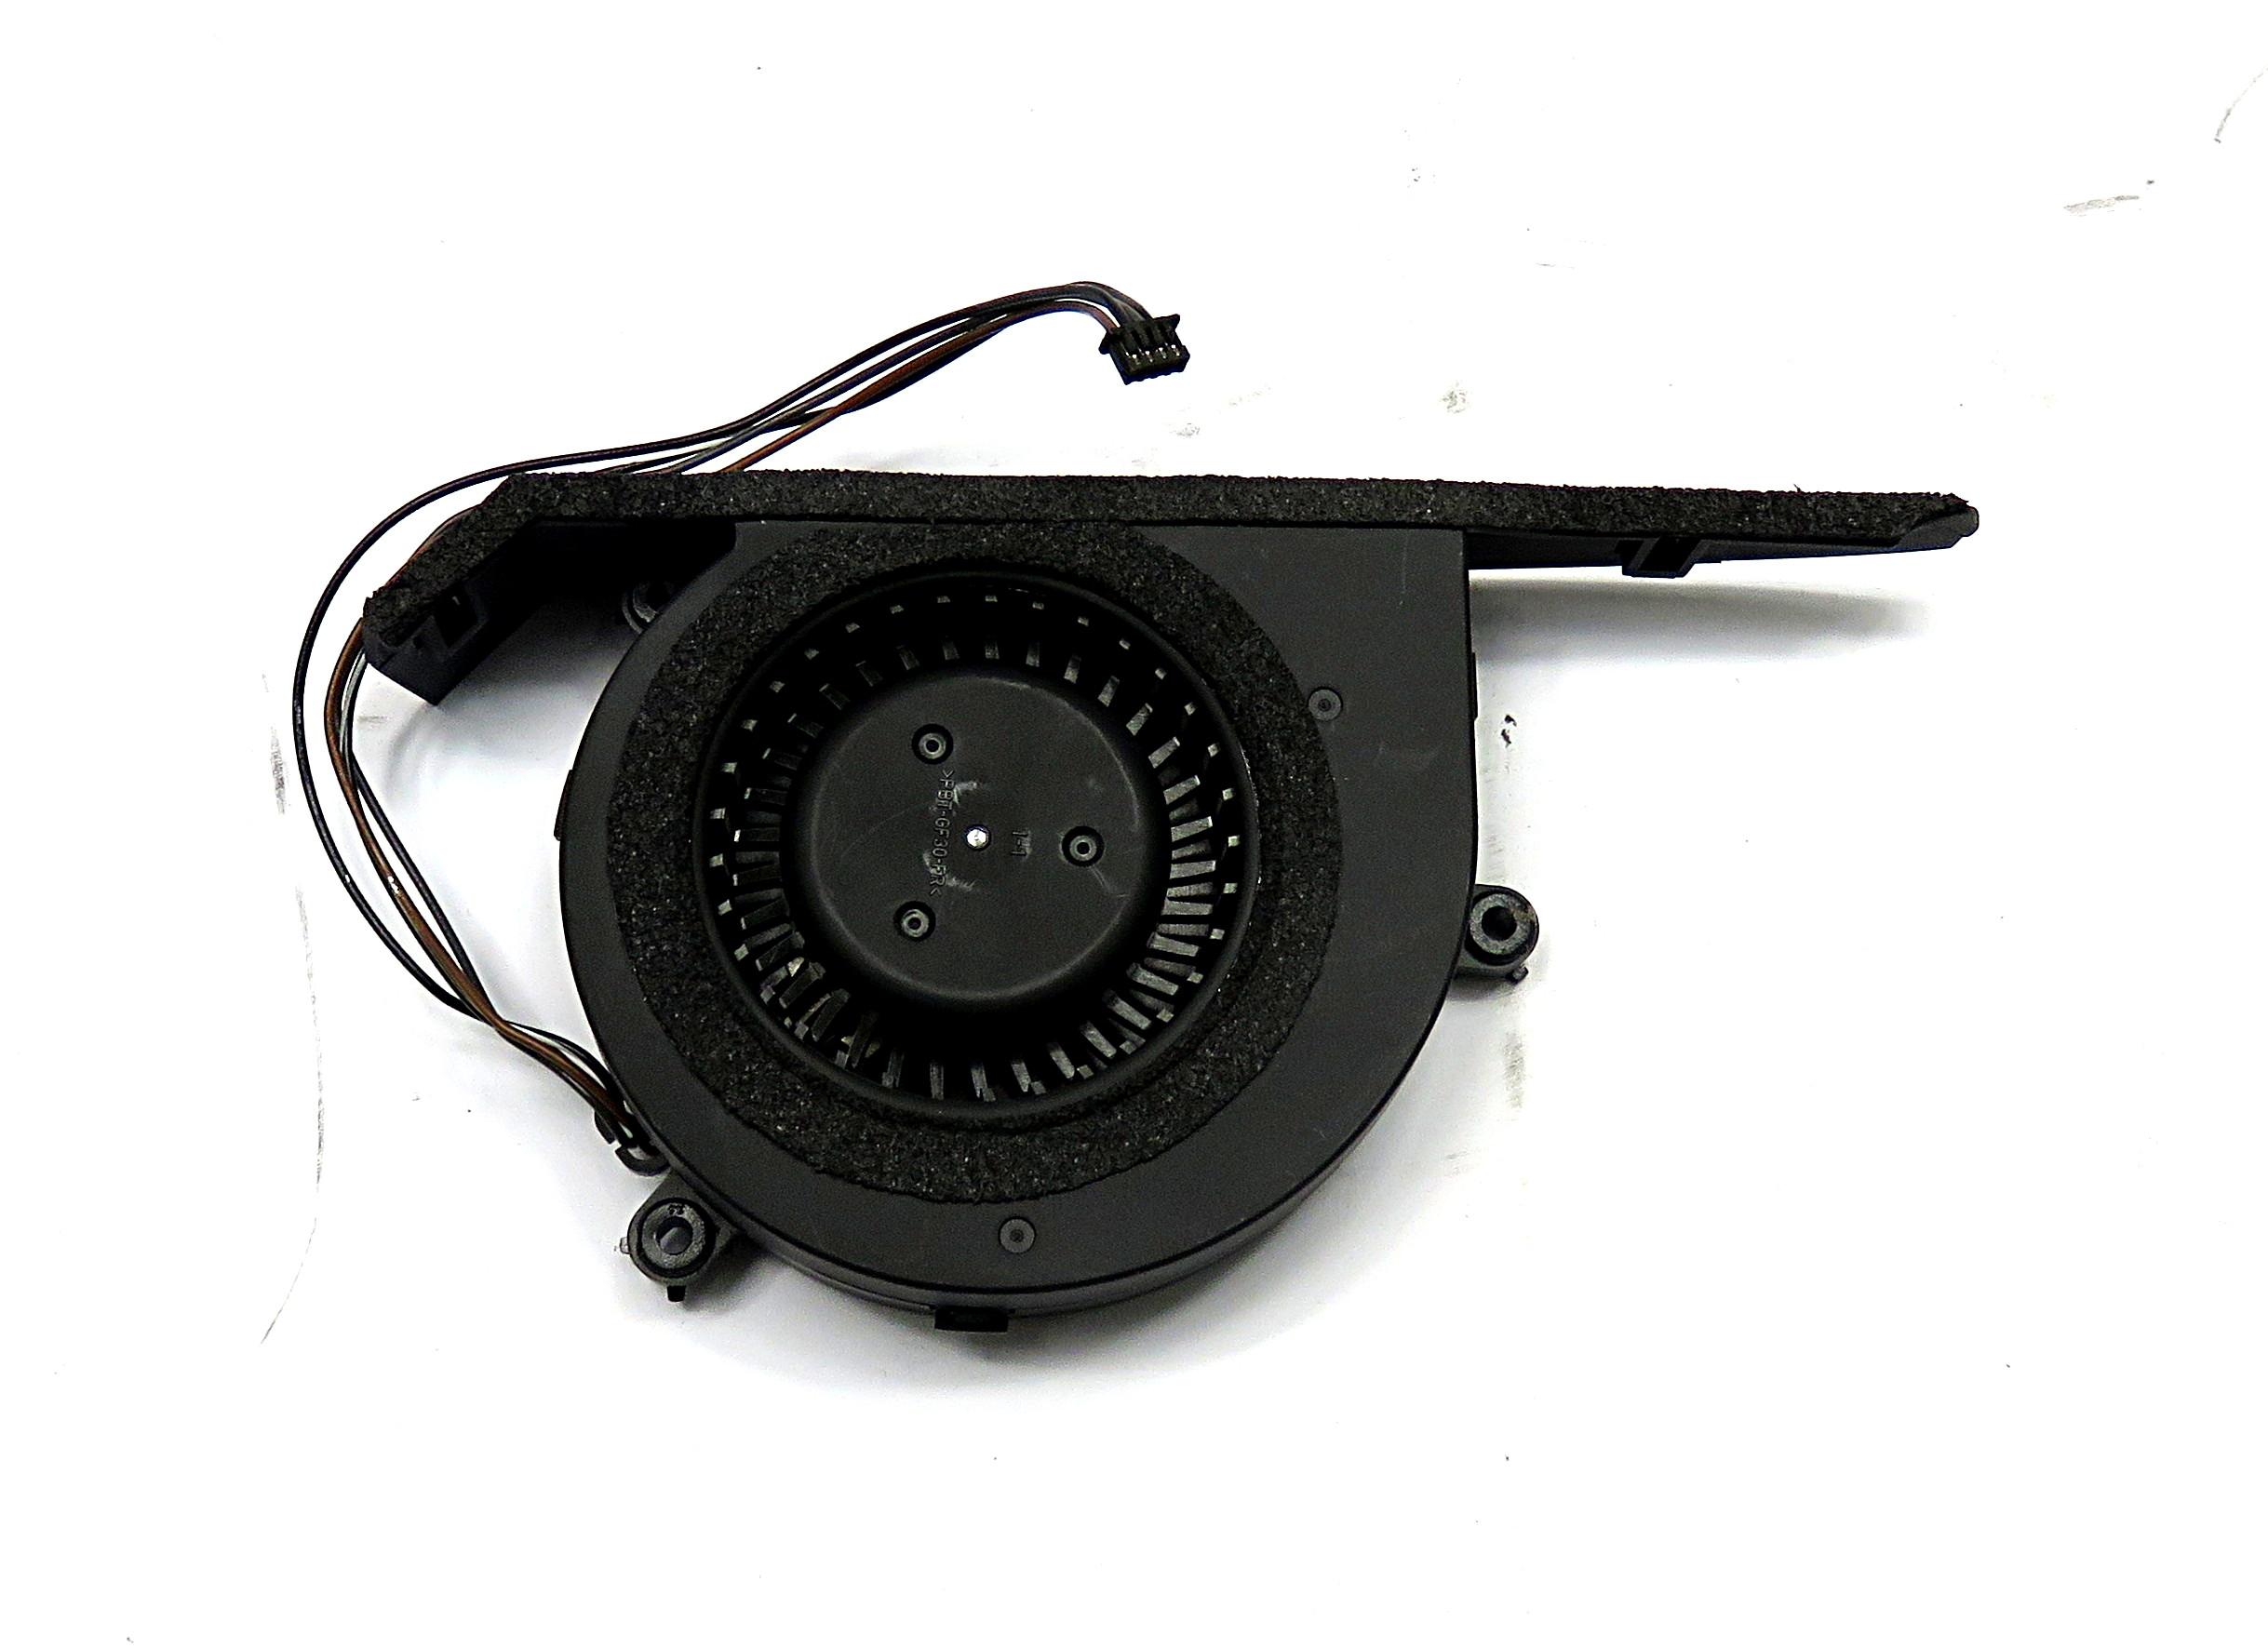 Apple 2118 Imac 20 Blower Type Cooling Fan BG0801-B045-000 620-3549